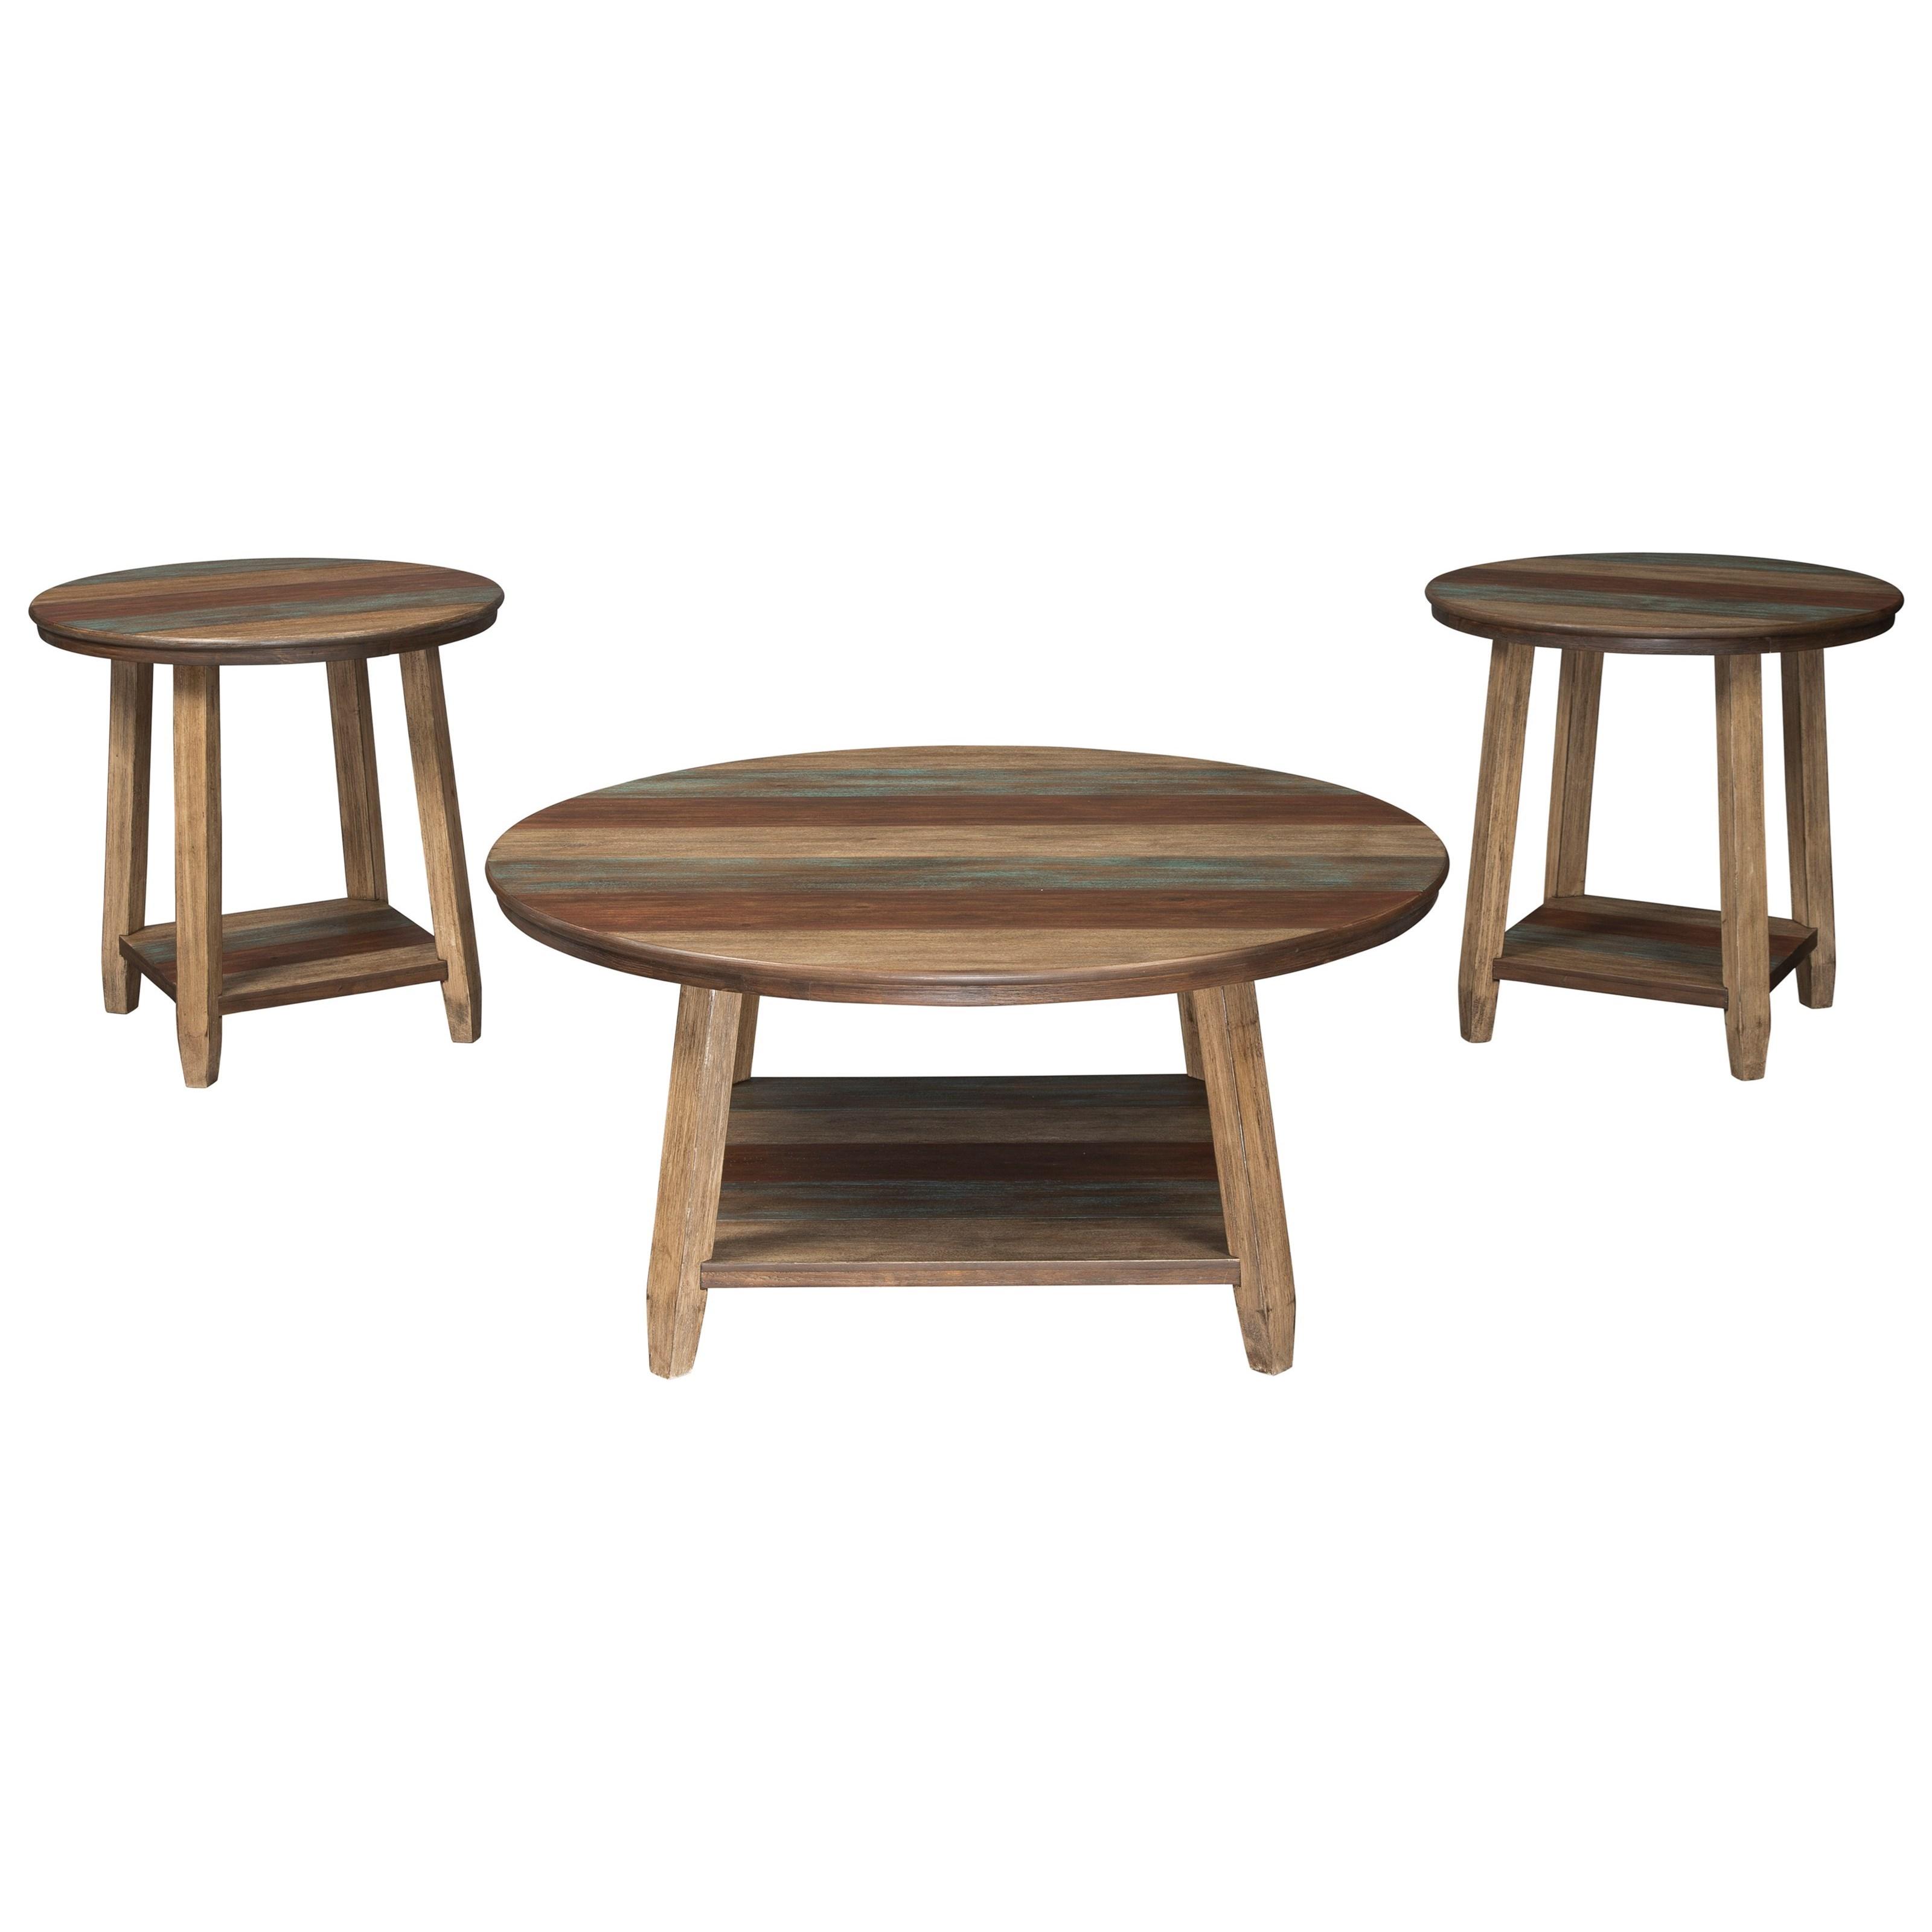 Raebecki Occasional Table Set by Ashley (Signature Design) at Johnny Janosik